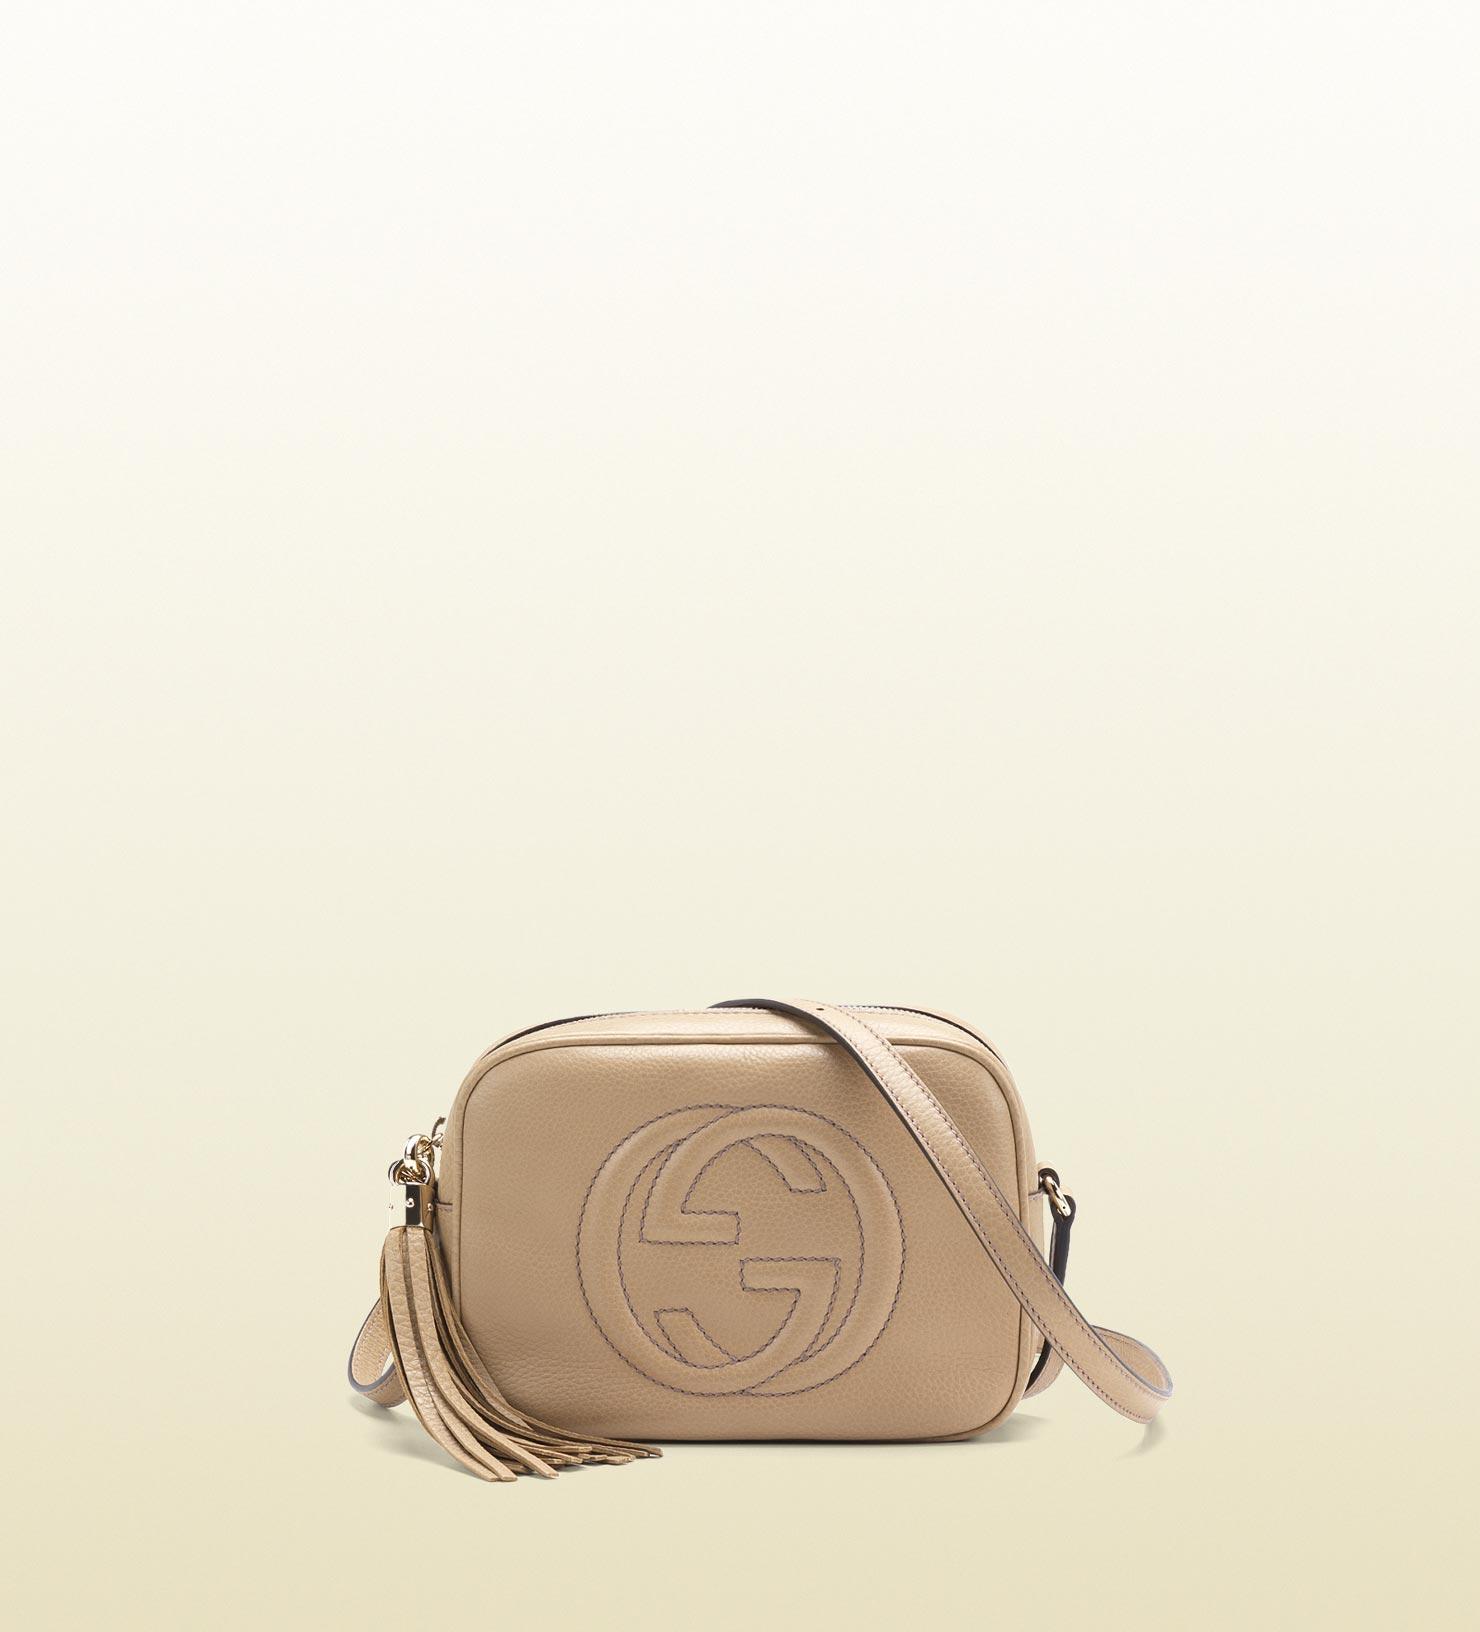 df95f42f89d6 Gucci Cream Leather Handbag - Image Of Handbags Imageorp.co